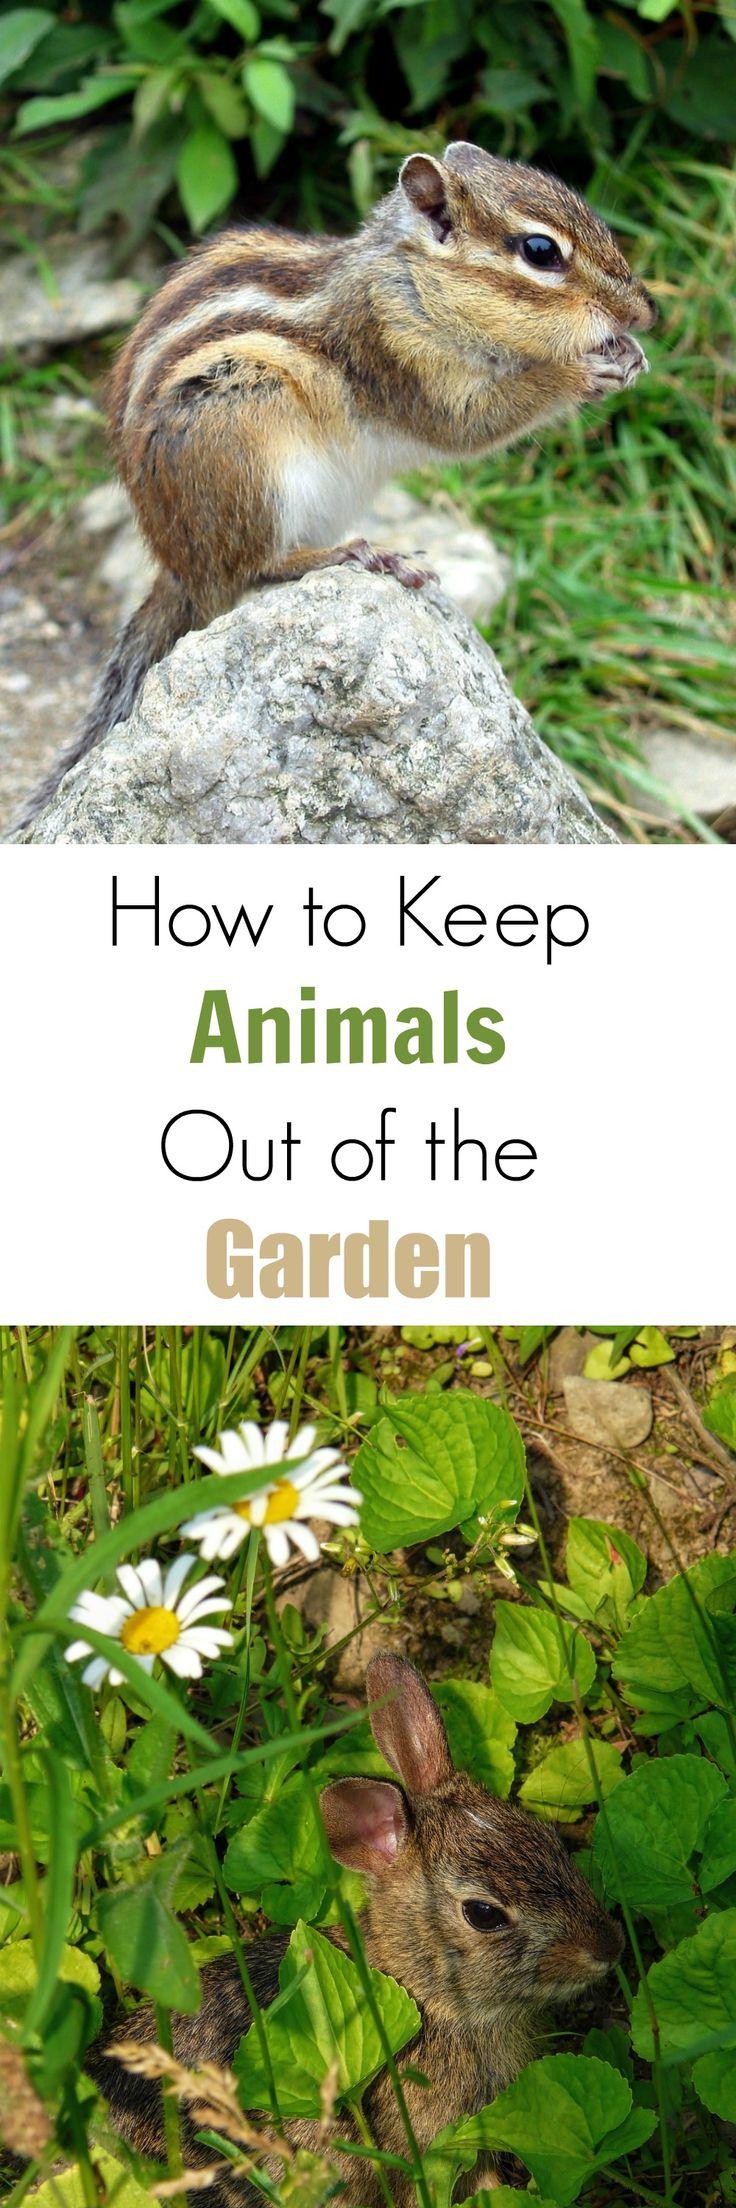 Garden Ideas To Keep Animals Out 744 best simple gardening ideas images on pinterest | gardening